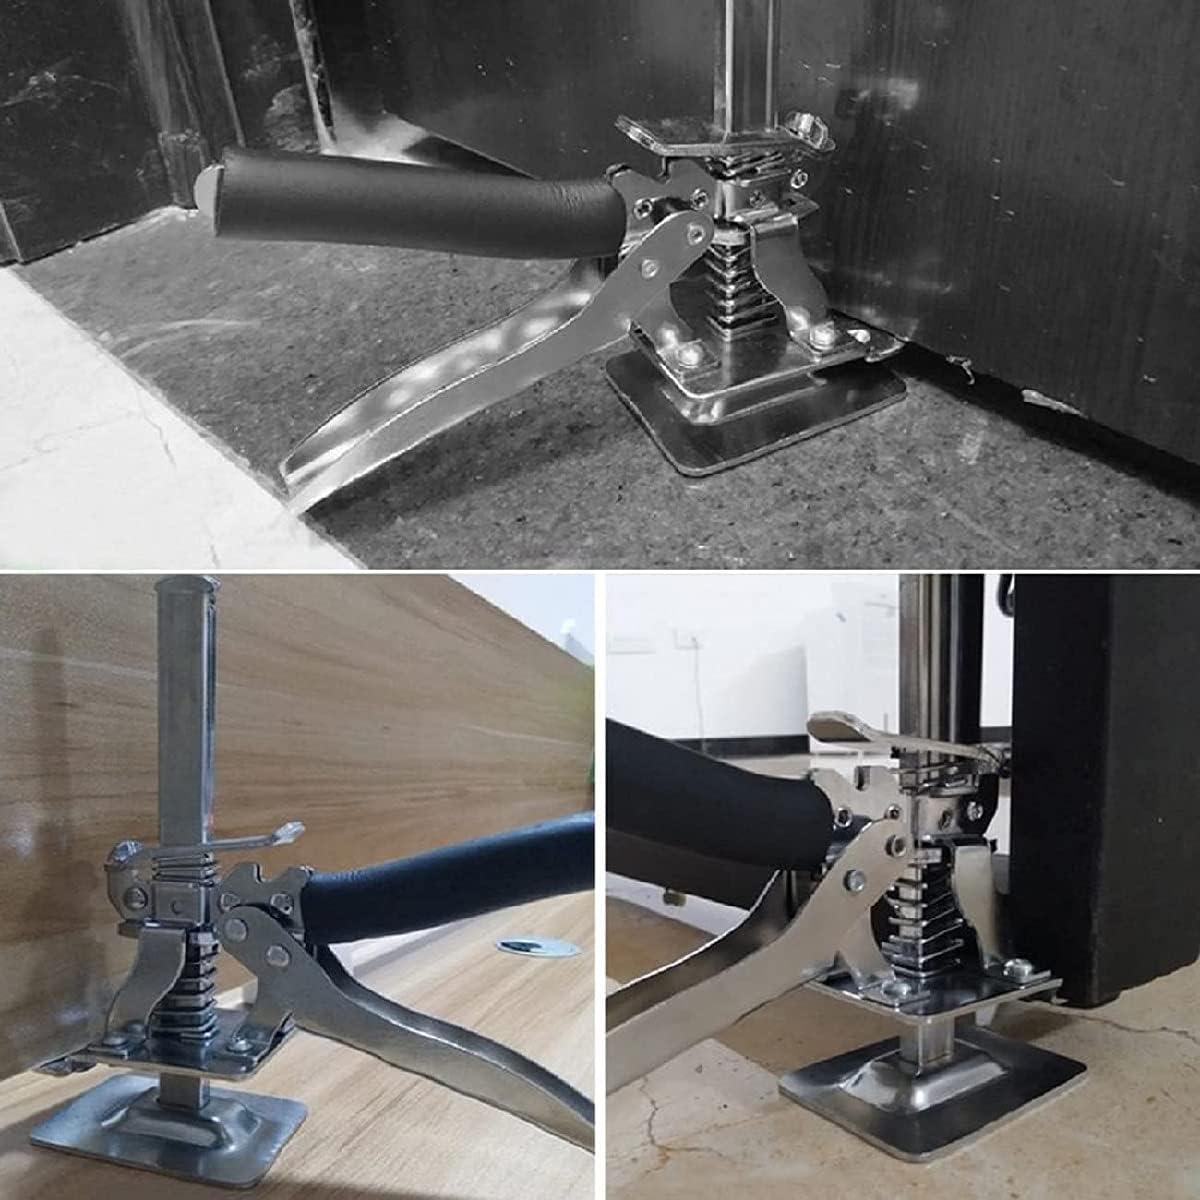 Arm Precision Clamping Tool High Bricklayer Paving Wandfliesen Artefakt-Werkzeug Ganzstahl-Keramikfliesen H/öhenverstellung Hebeger/ät